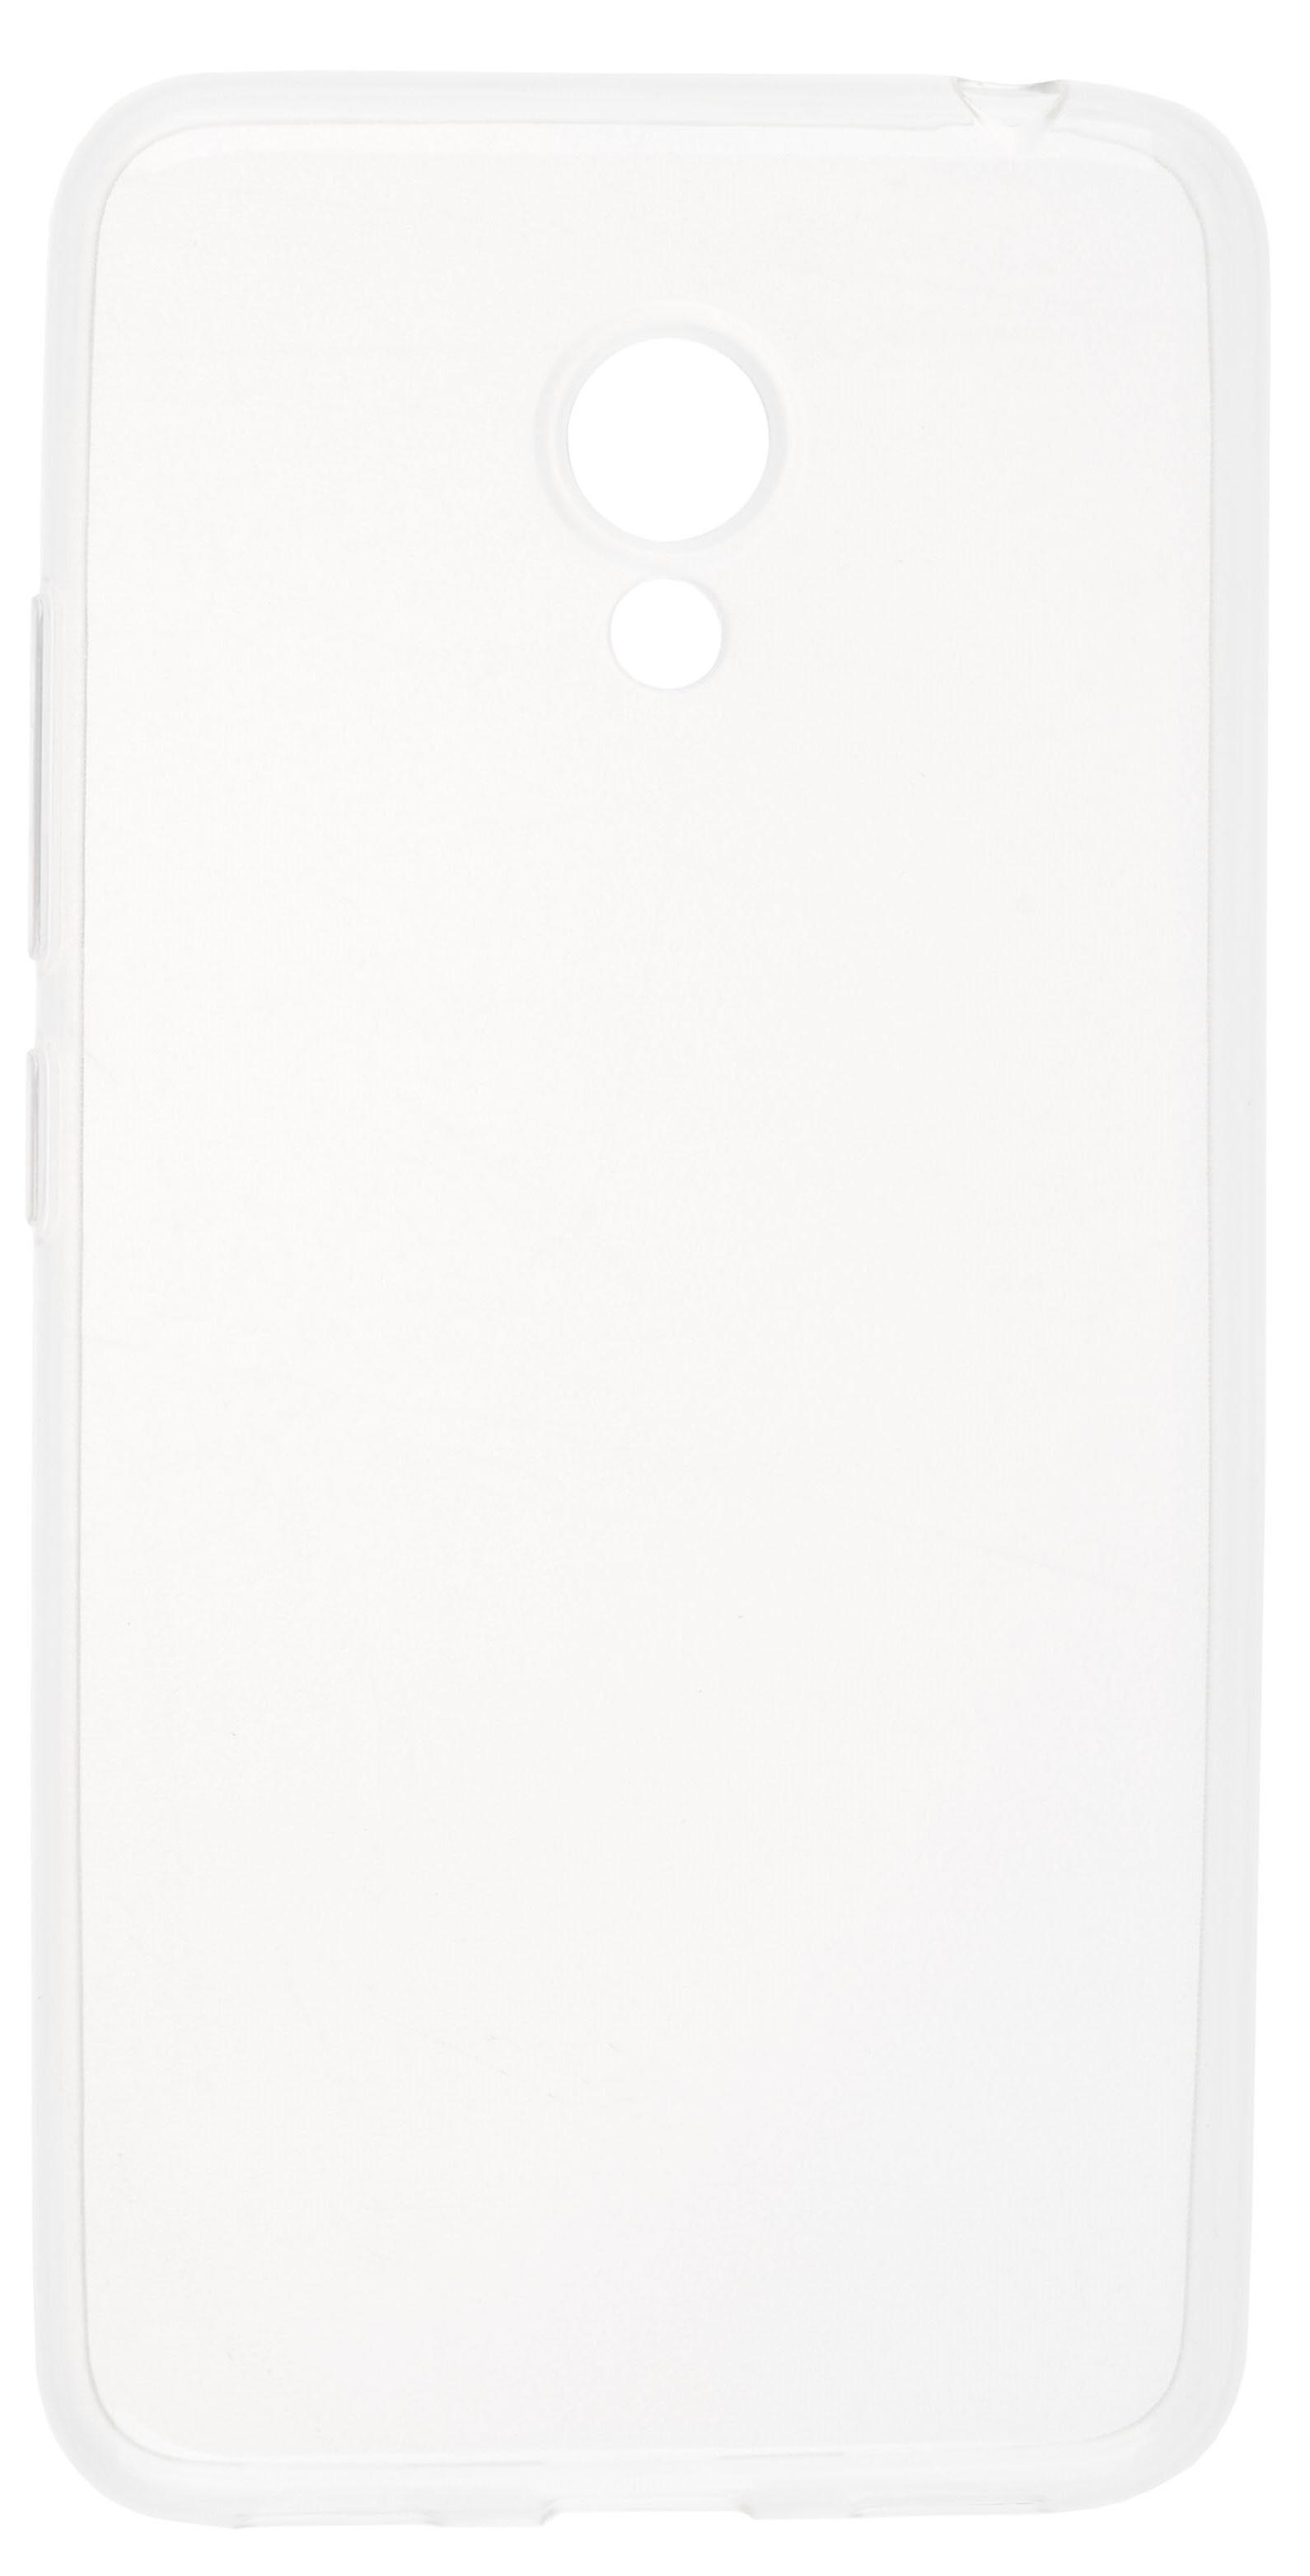 Чехол для сотового телефона skinBOX Slim Silicone, 4660041407570, прозрачный чехол для сотового телефона skinbox slim silicone 4660041408157 прозрачный